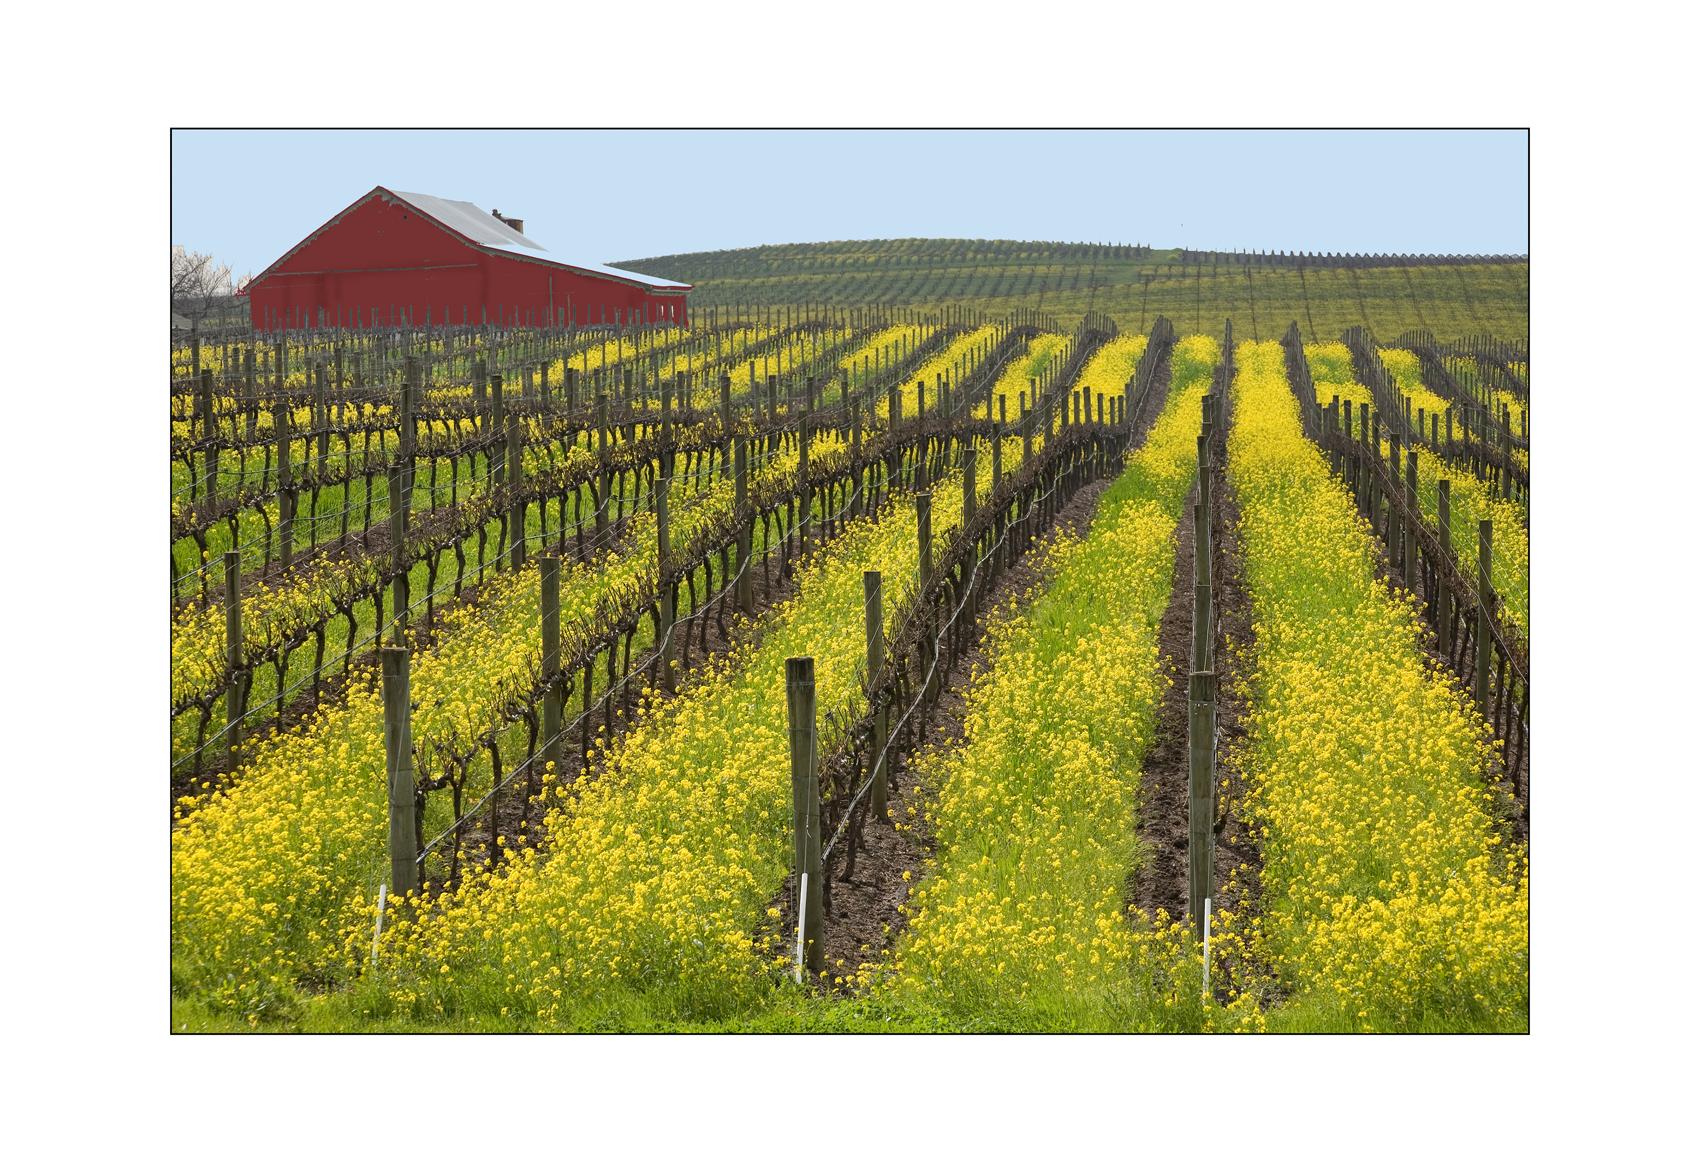 Napa vineyards in mustard season